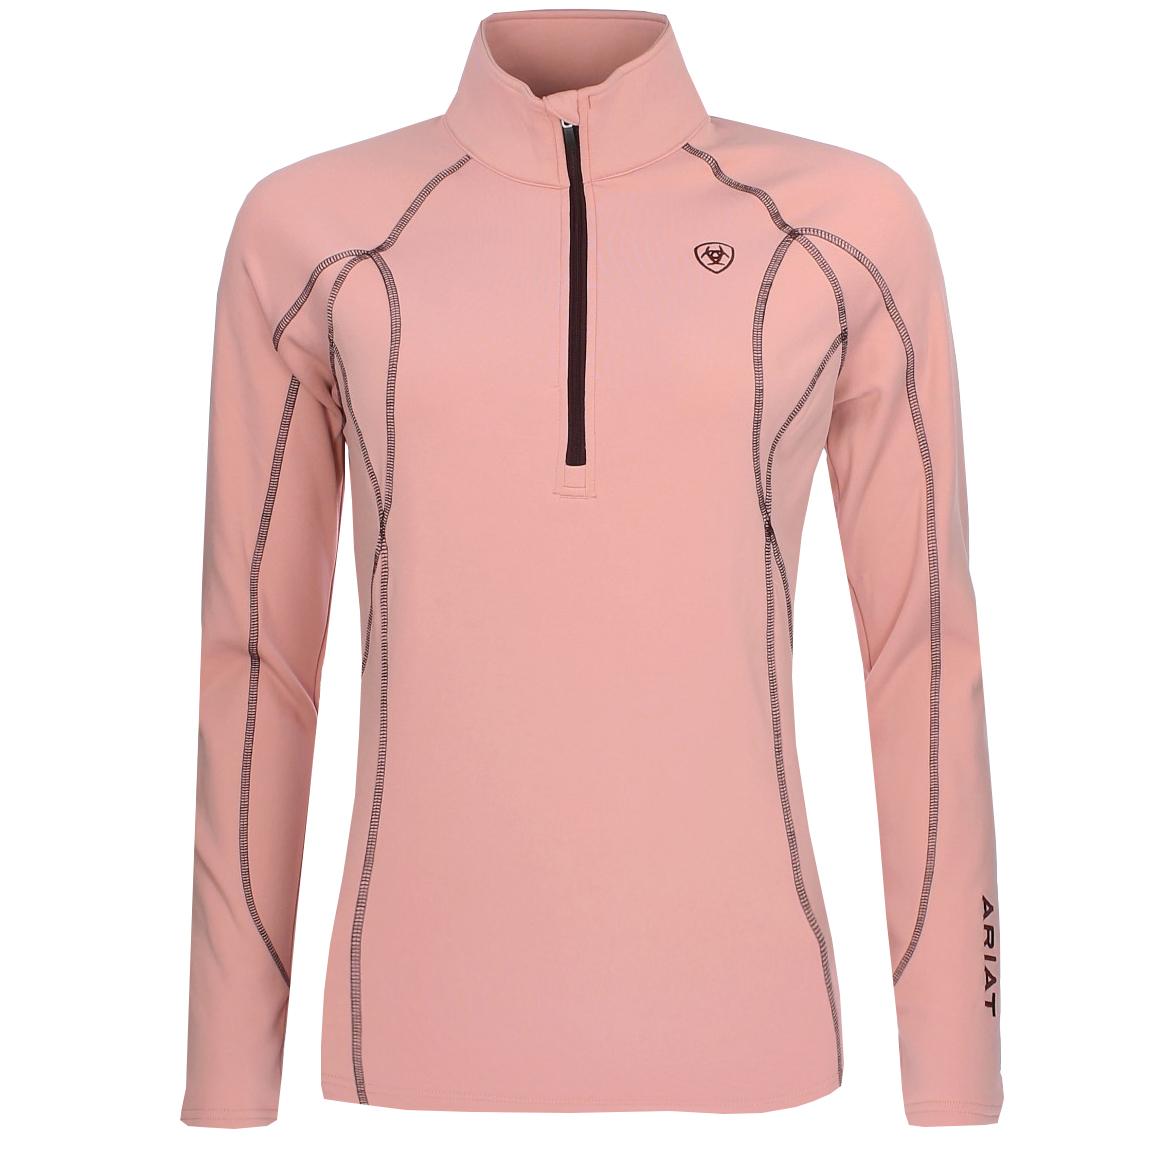 Ariat Conquest nj20 techshirt roze maat:m